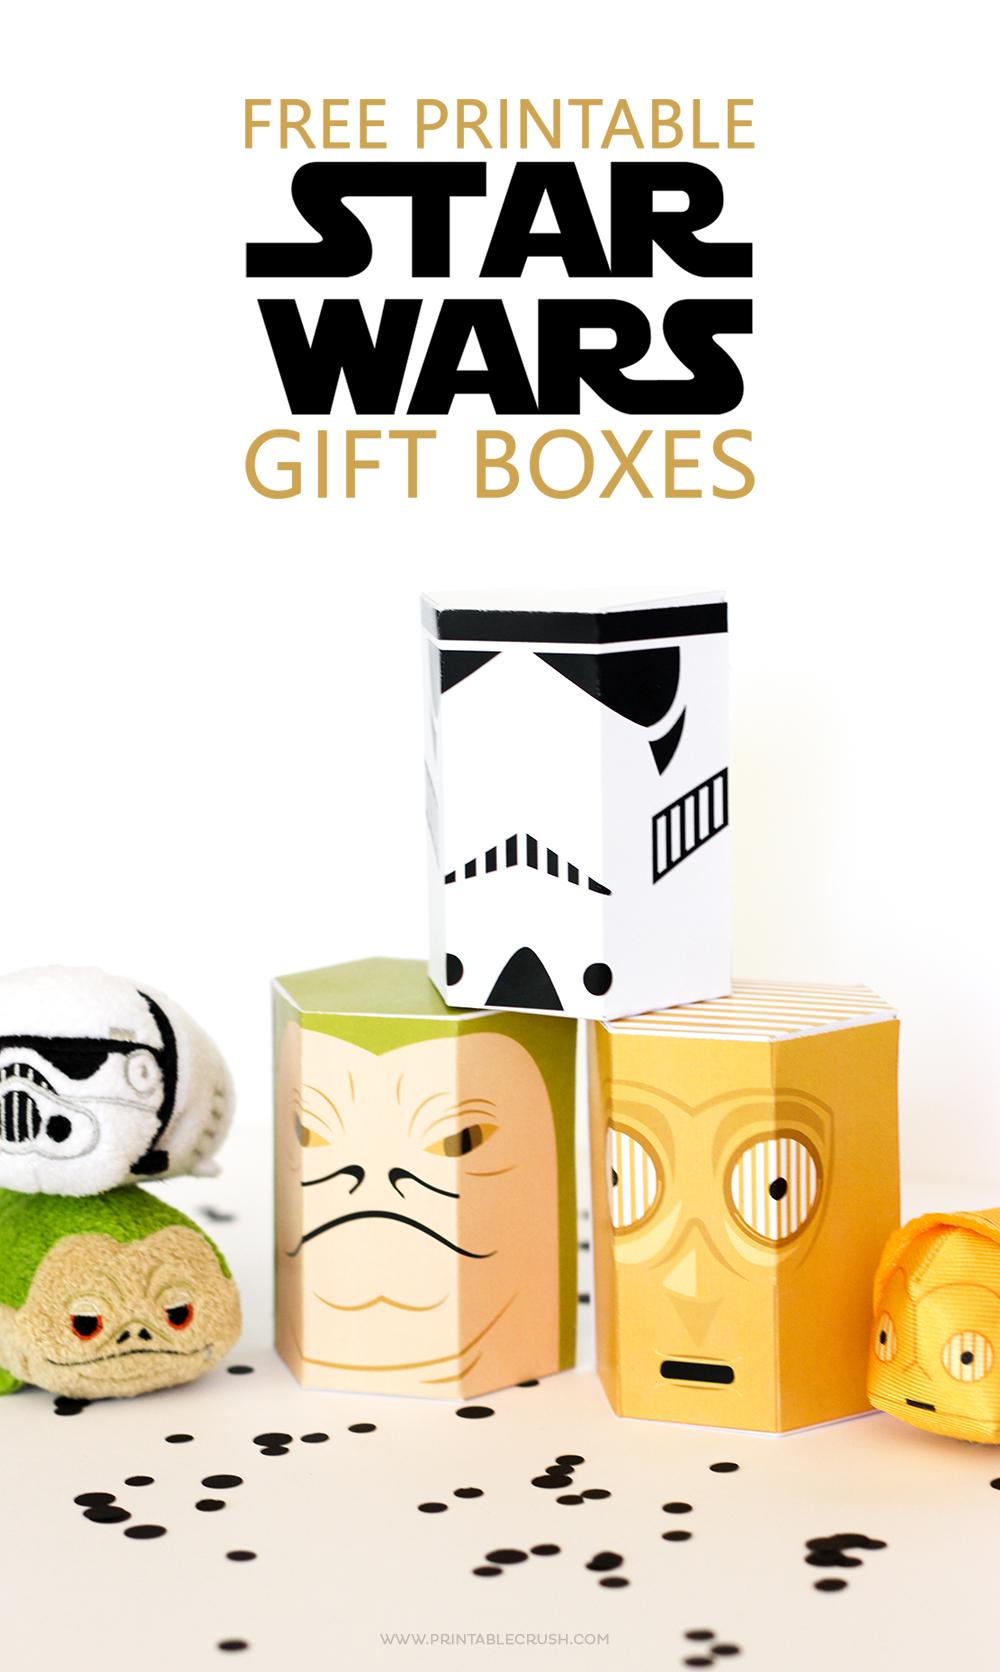 FREE Star Wars Printable Gift Boxes Printable Crush